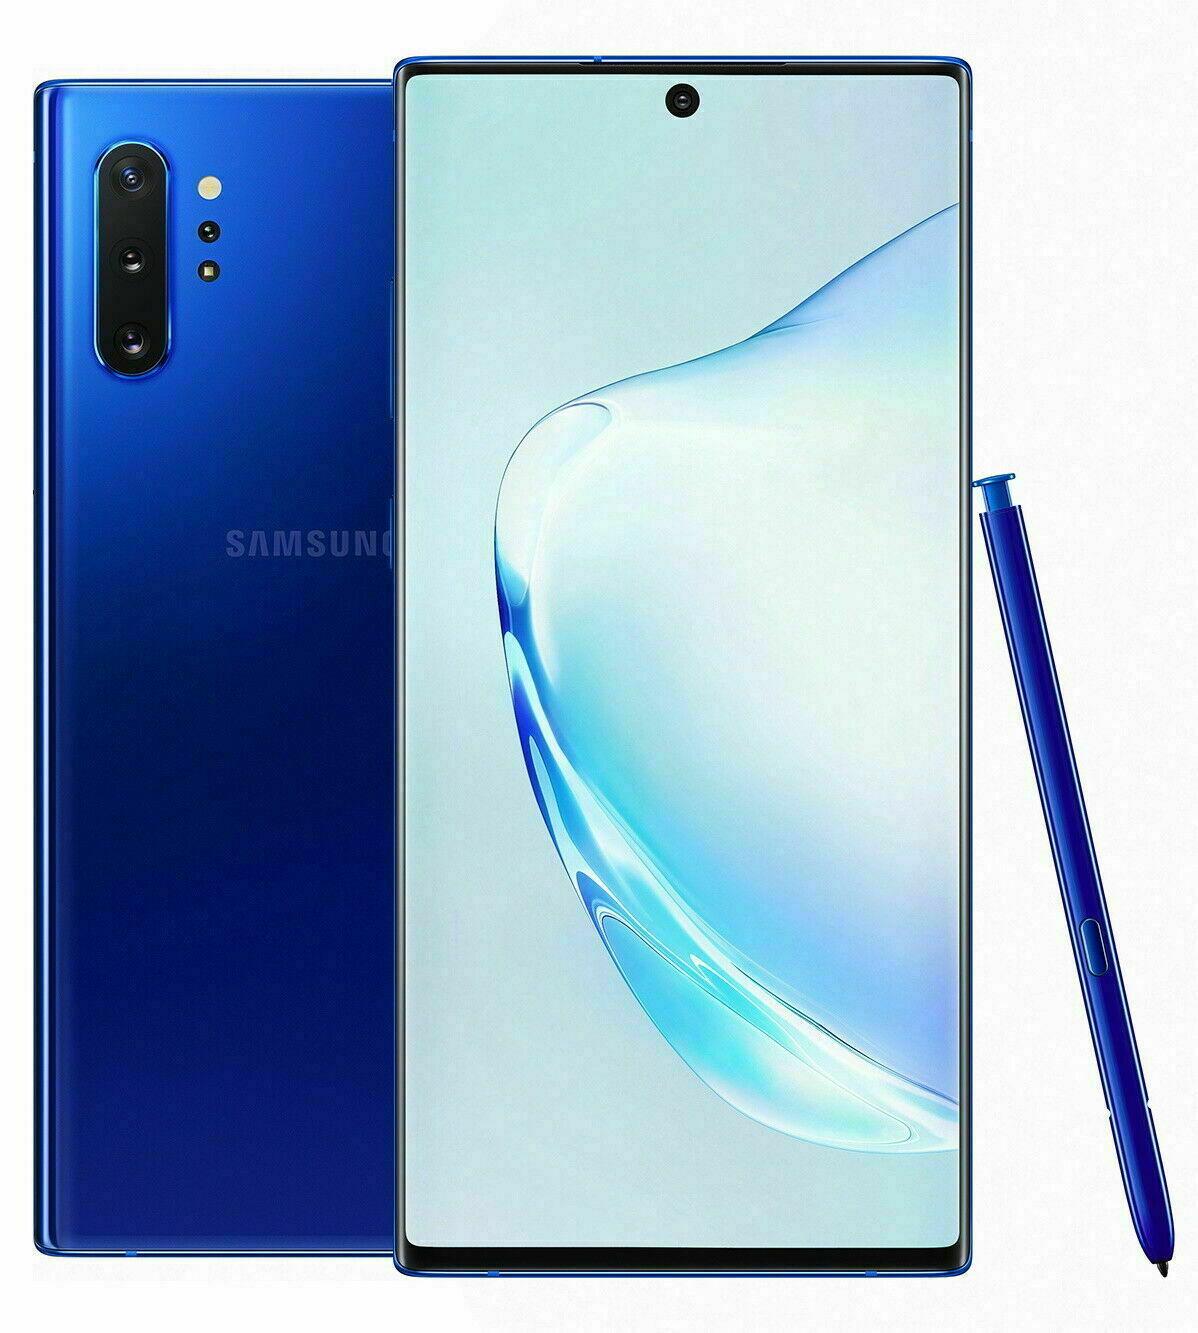 NEW Samsung Galaxy NOTE 10+ Plus 256/512GB (SM-N975U1, Factory Unlocked)⚫⚪🔵🟣SW. Buy it now for 659.99